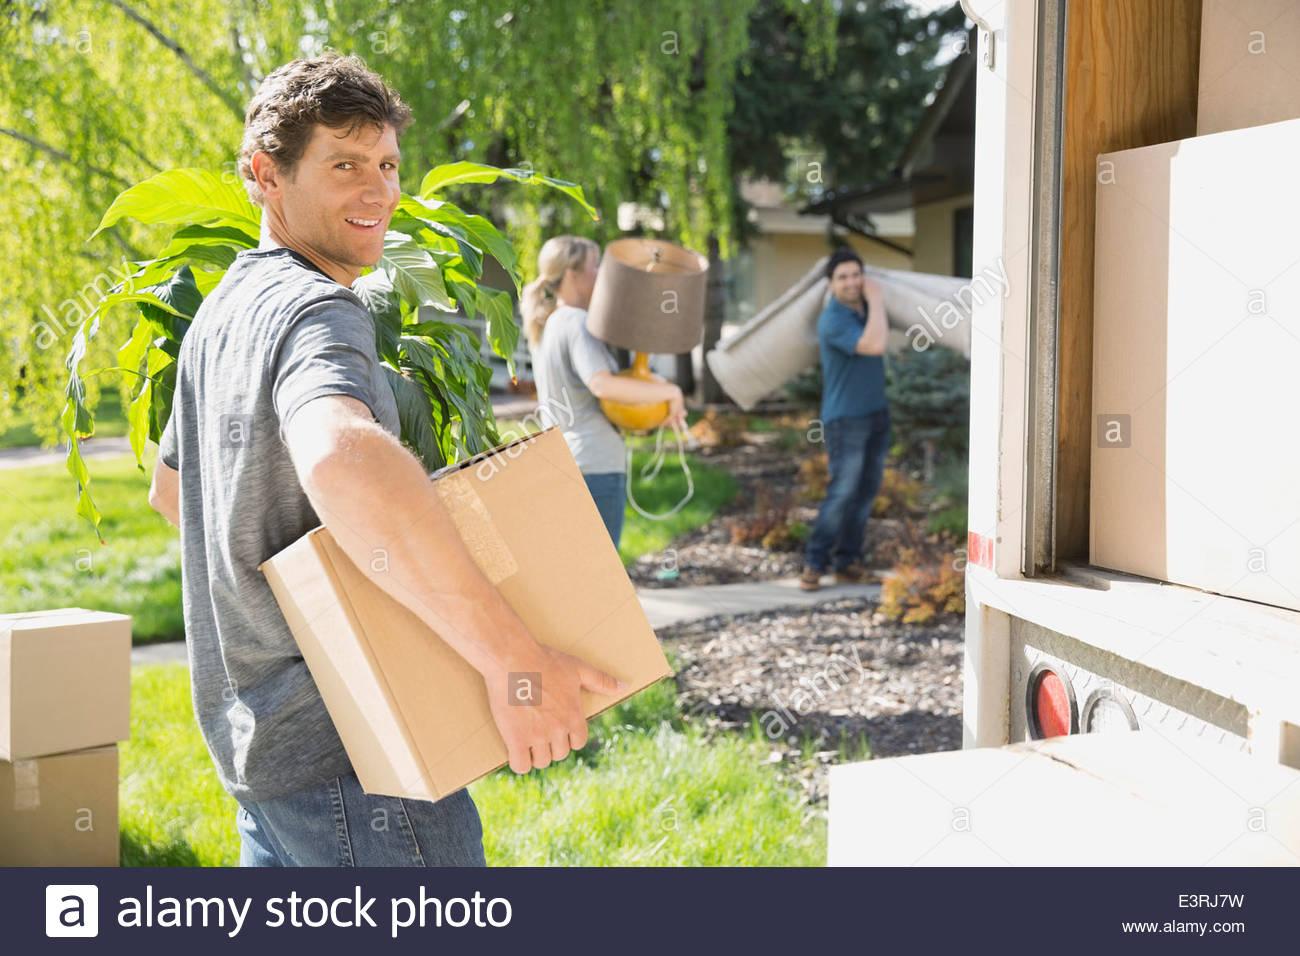 Portrait of man unloading moving van - Stock Image